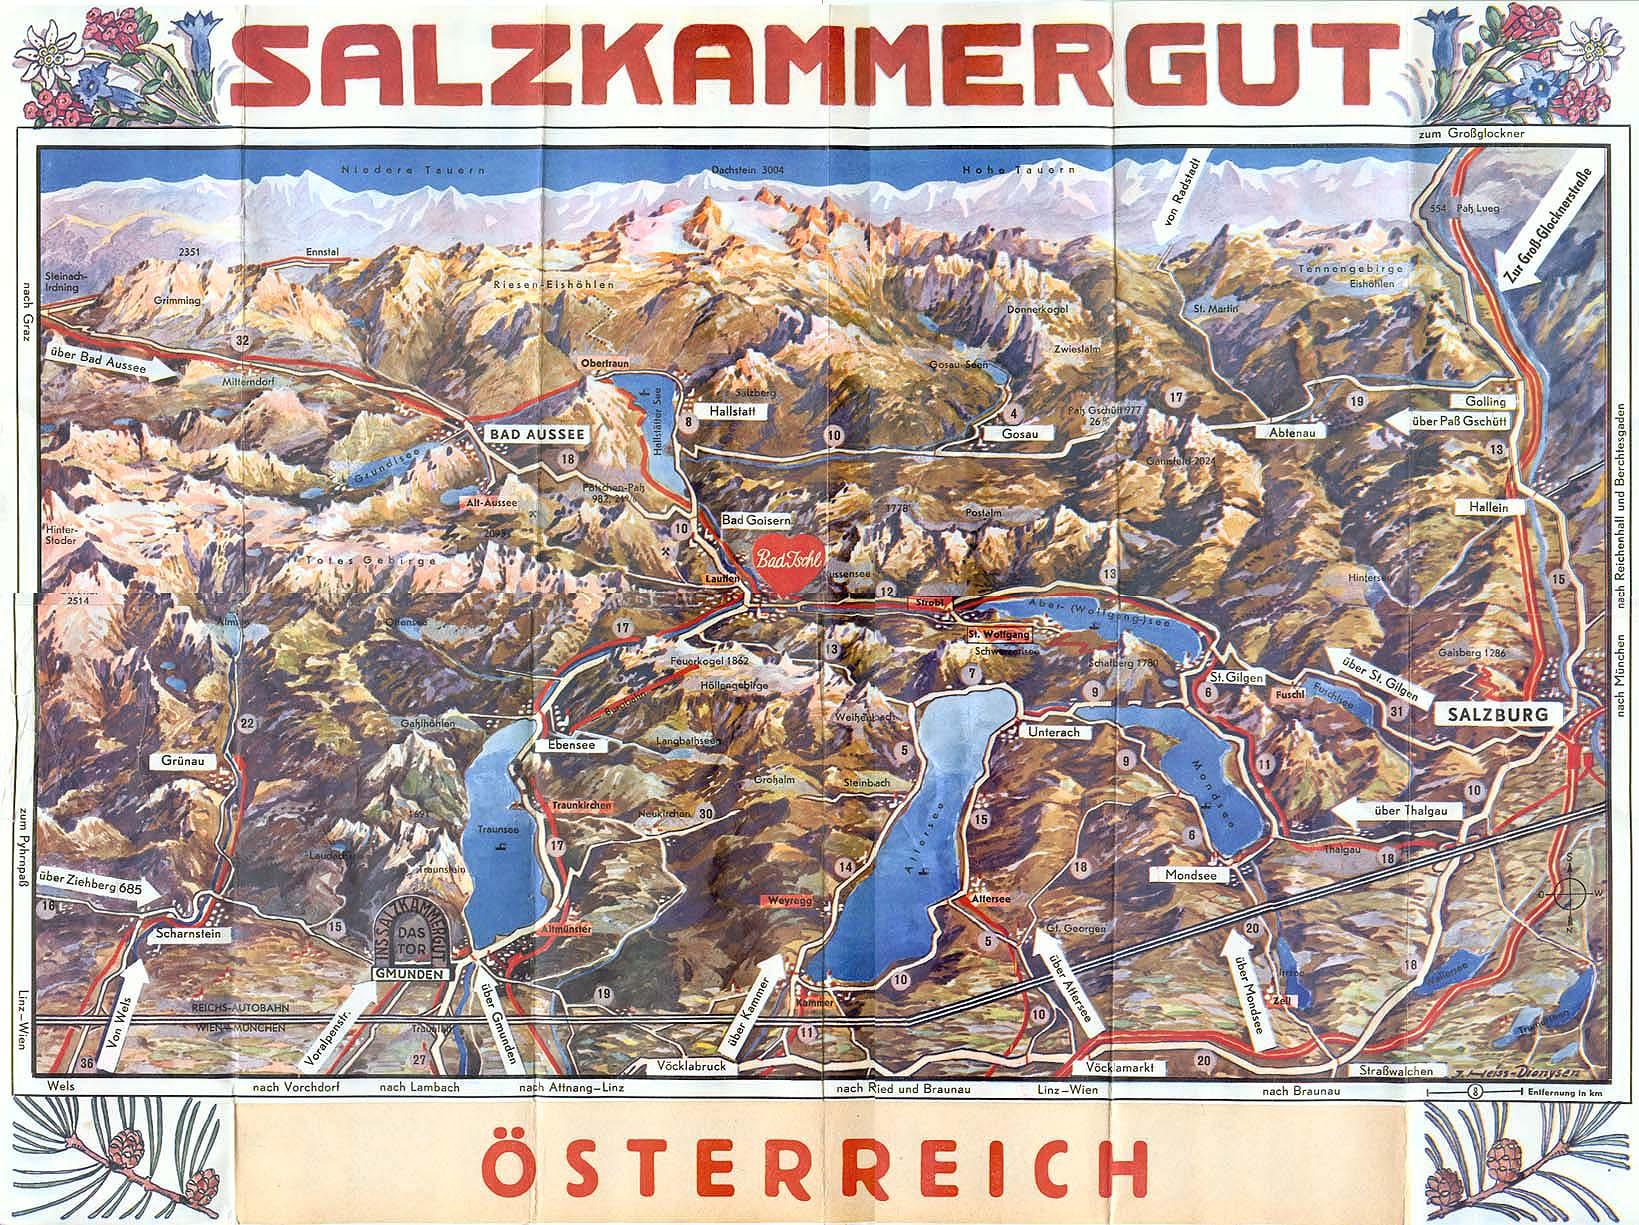 SalzkammergutDwgMap.jpg